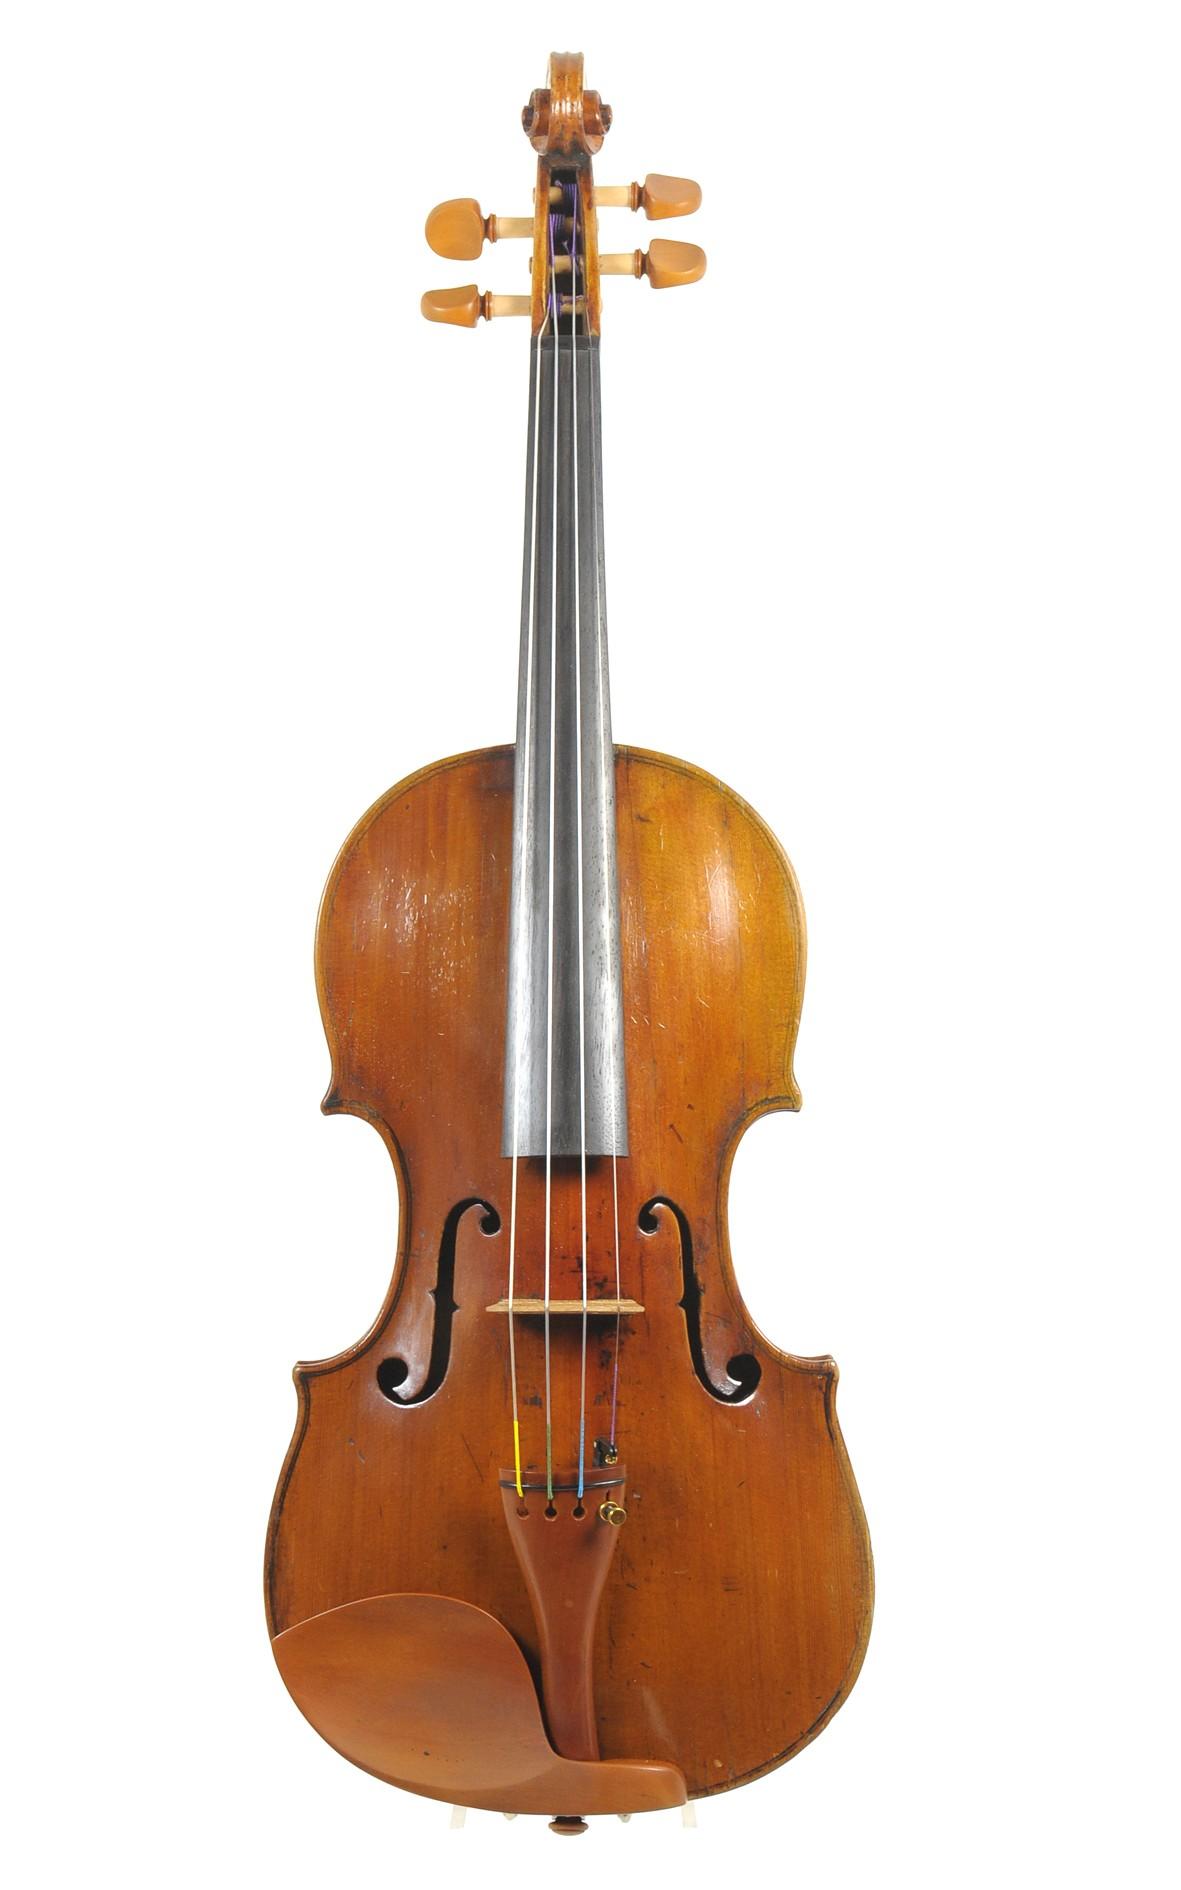 Charles & Samuel Thompson violin, London 1770 - top